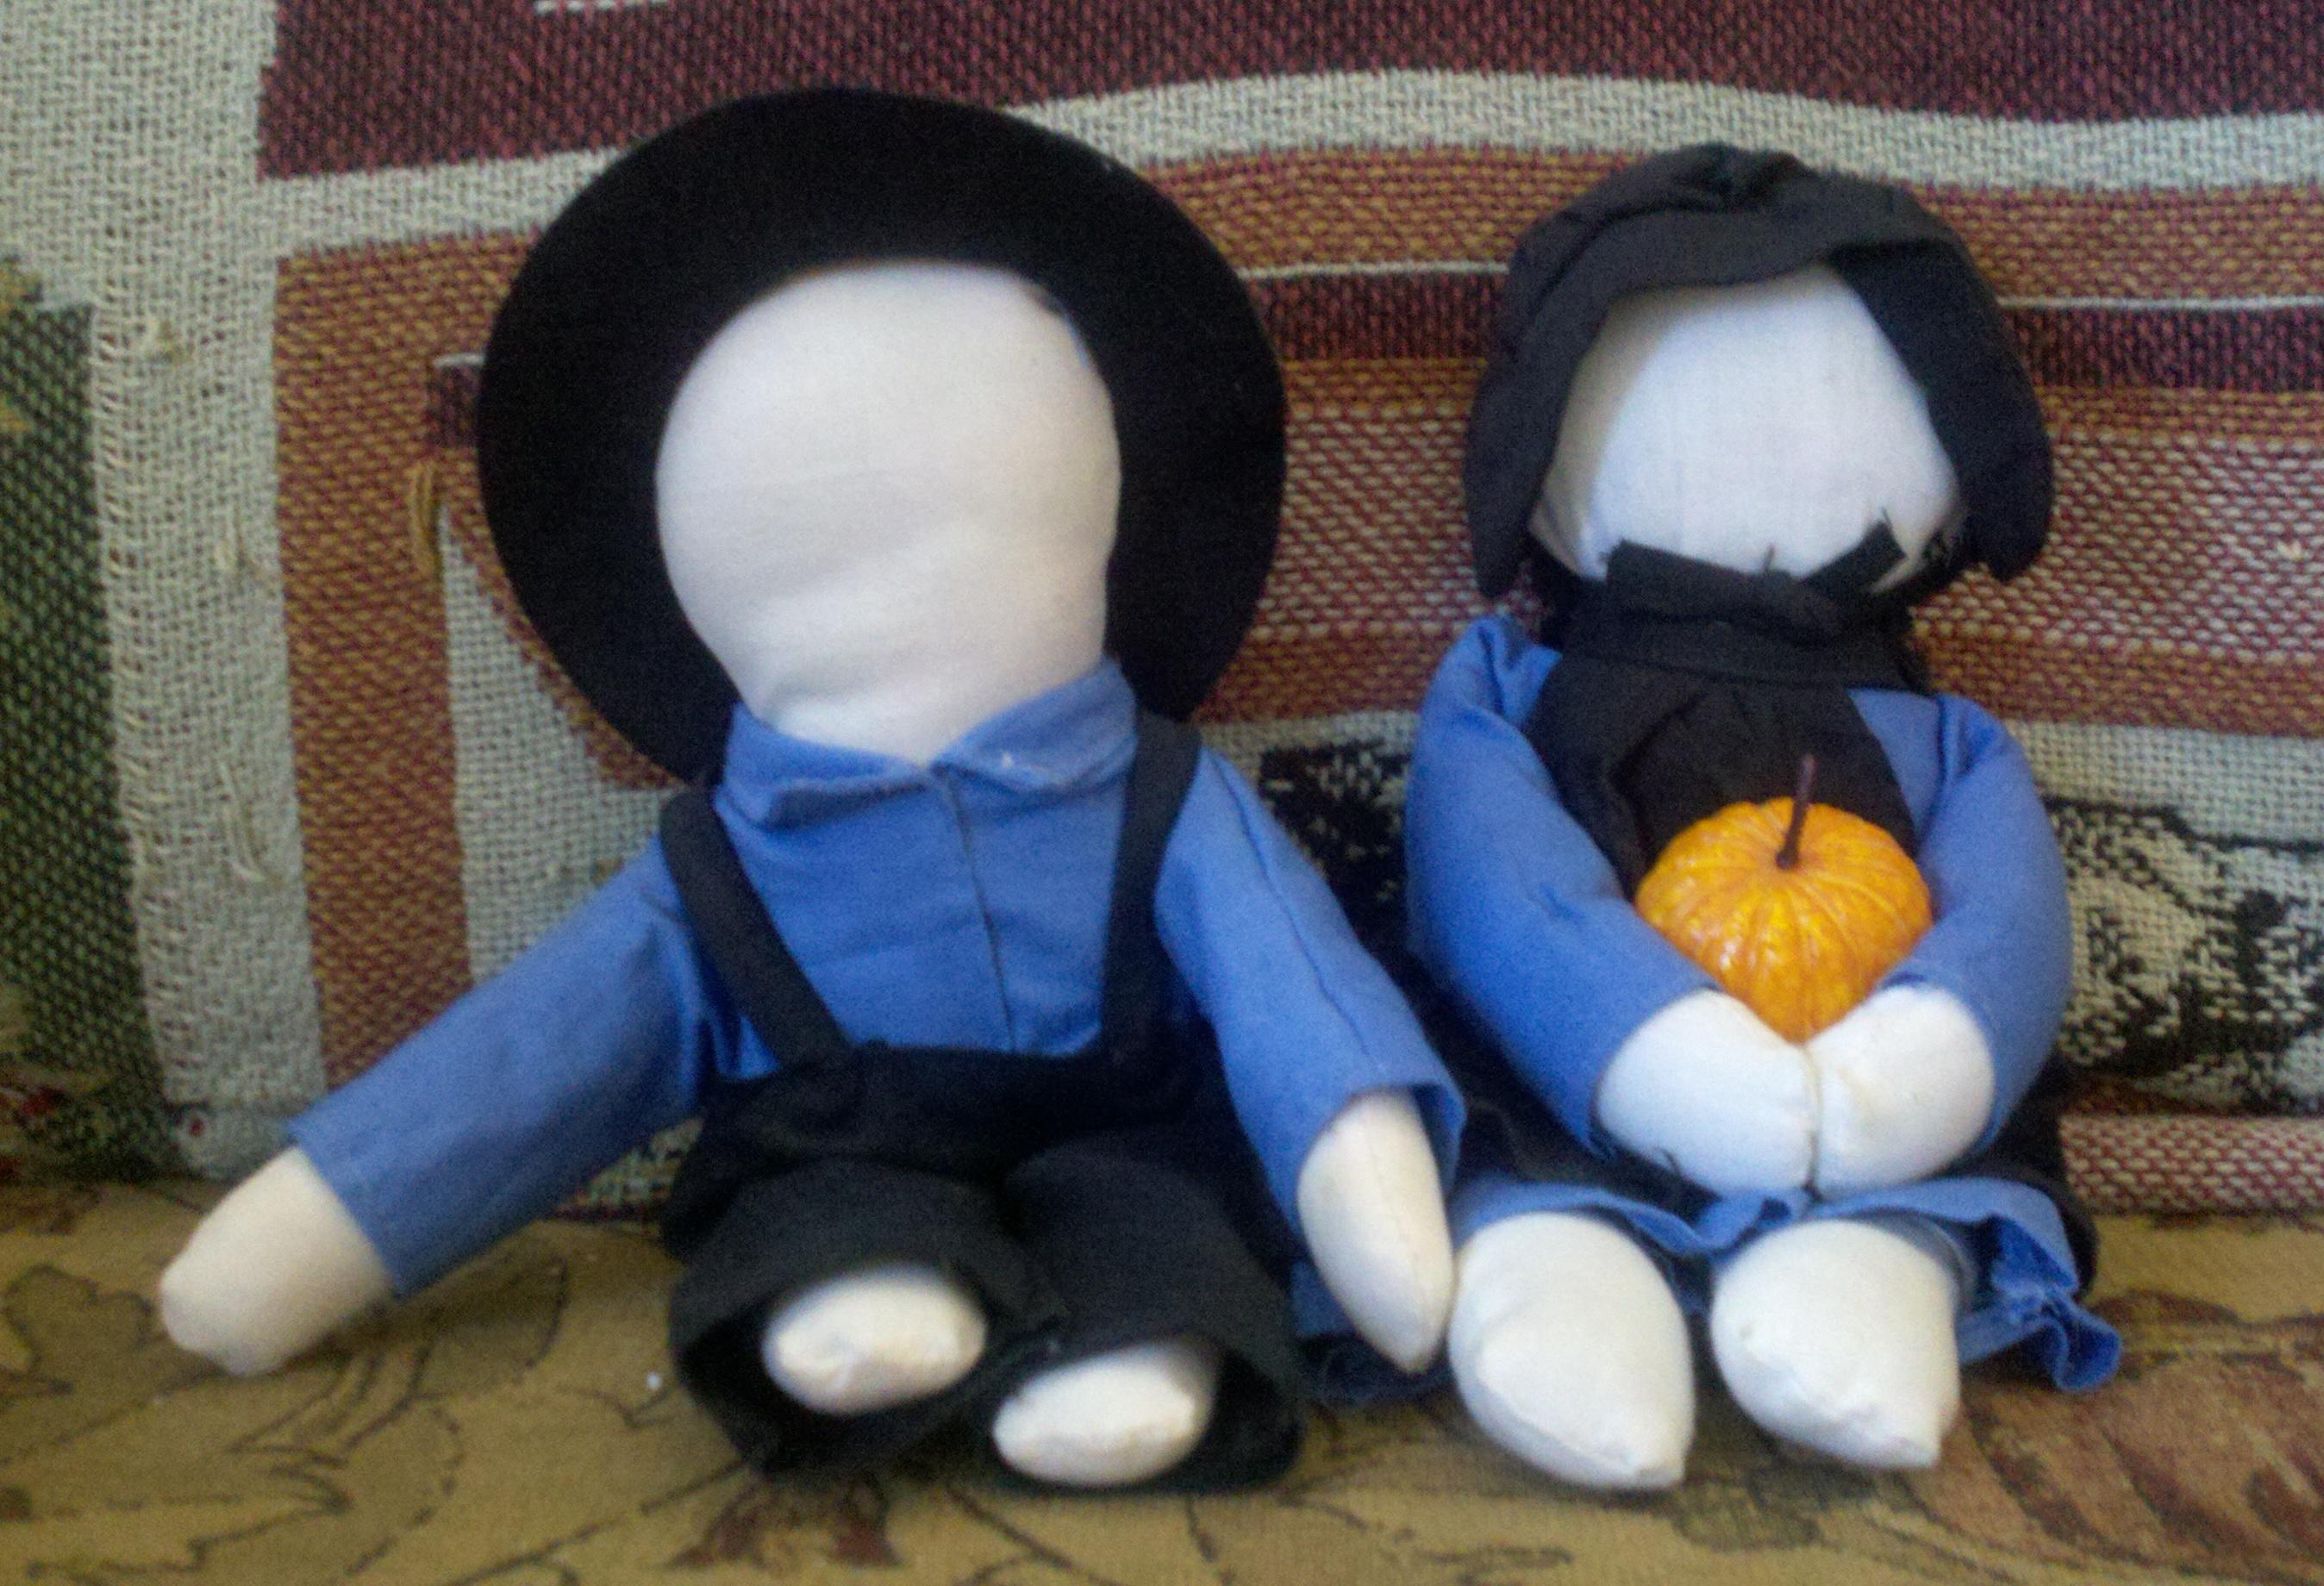 File:Amish Dolls.jpg - Wikipedia